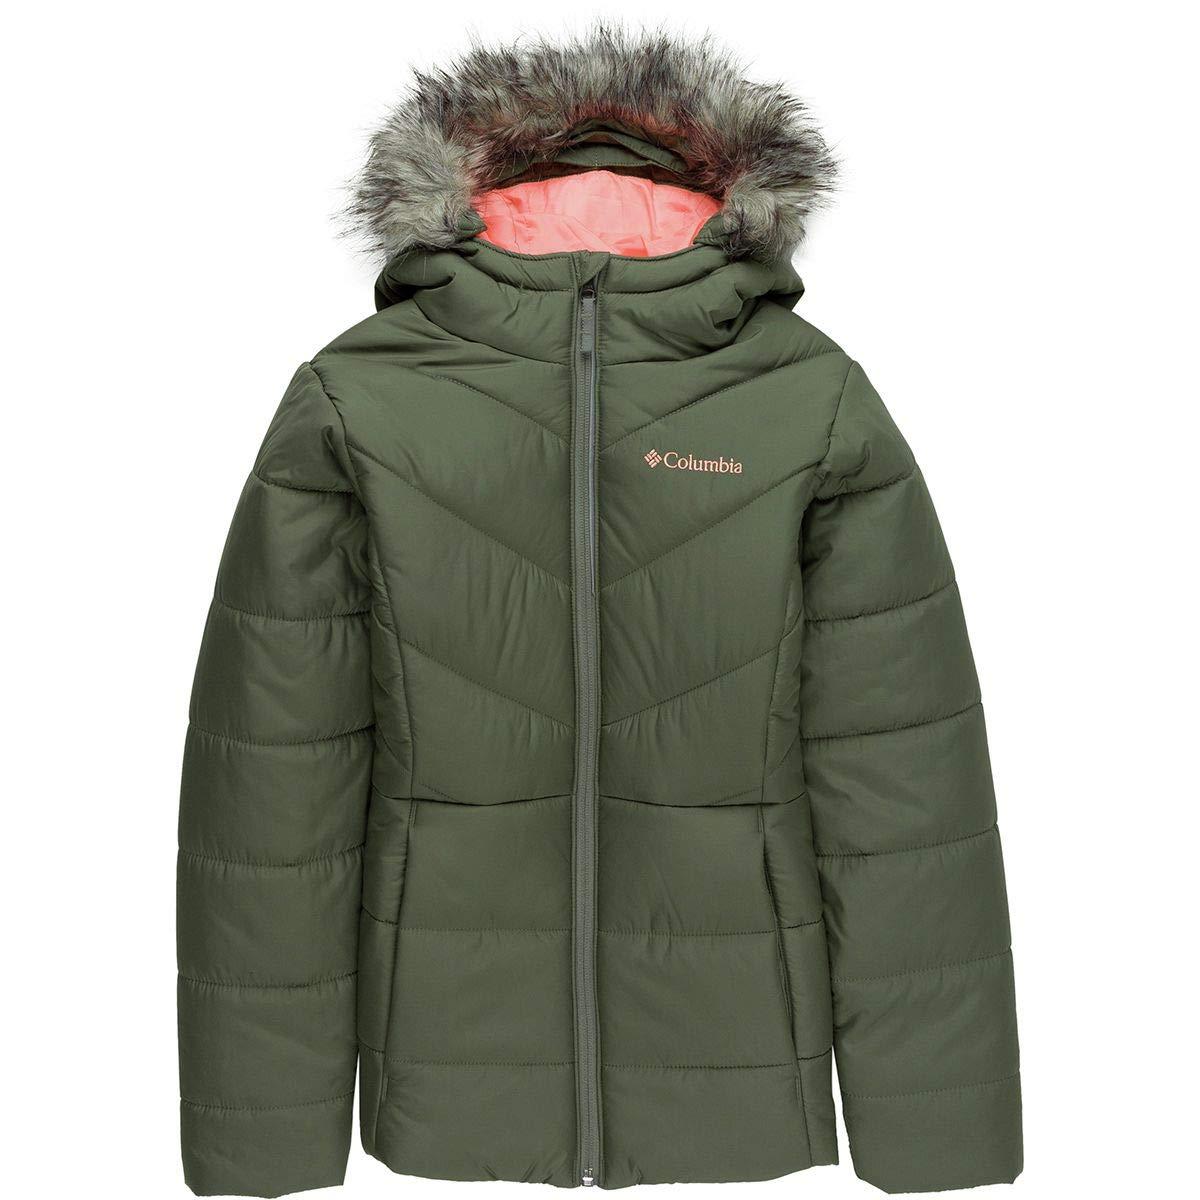 Columbia Kids Girl's Katelyn Crest¿ Jacket (Little Kids/Big Kids) Cypress/Tiki Pink Large